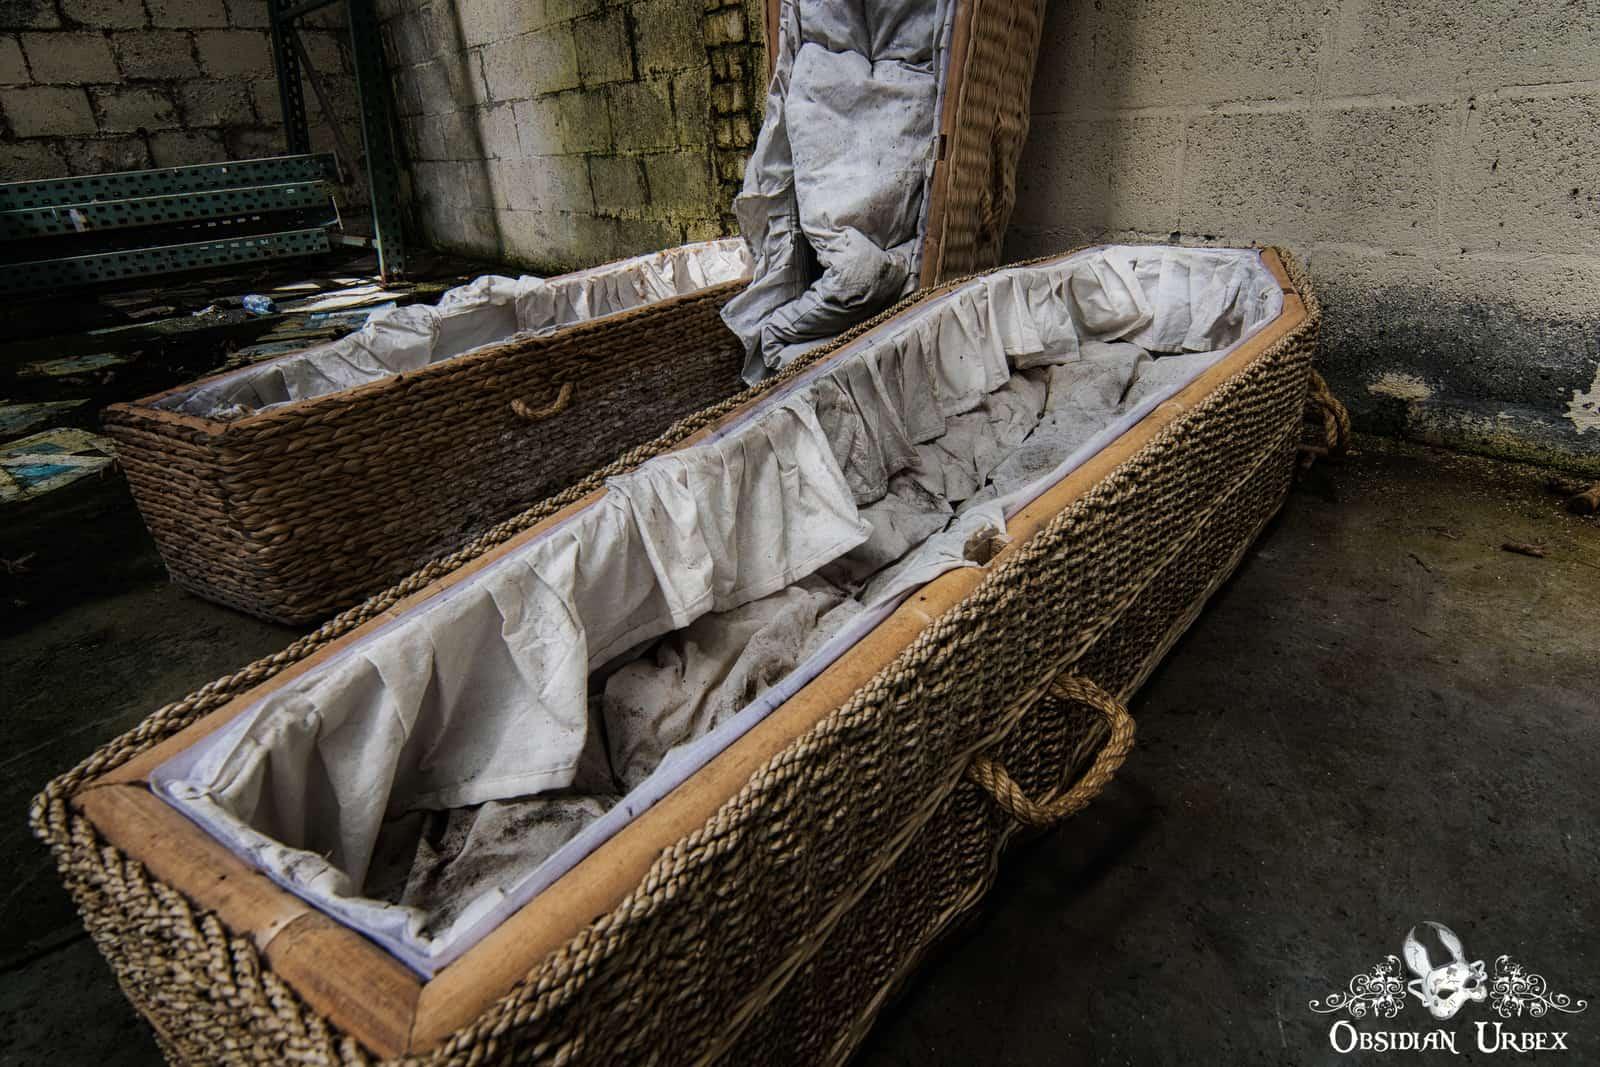 Lost Coffins Coffin Factory Belgium Obsidian Urbex